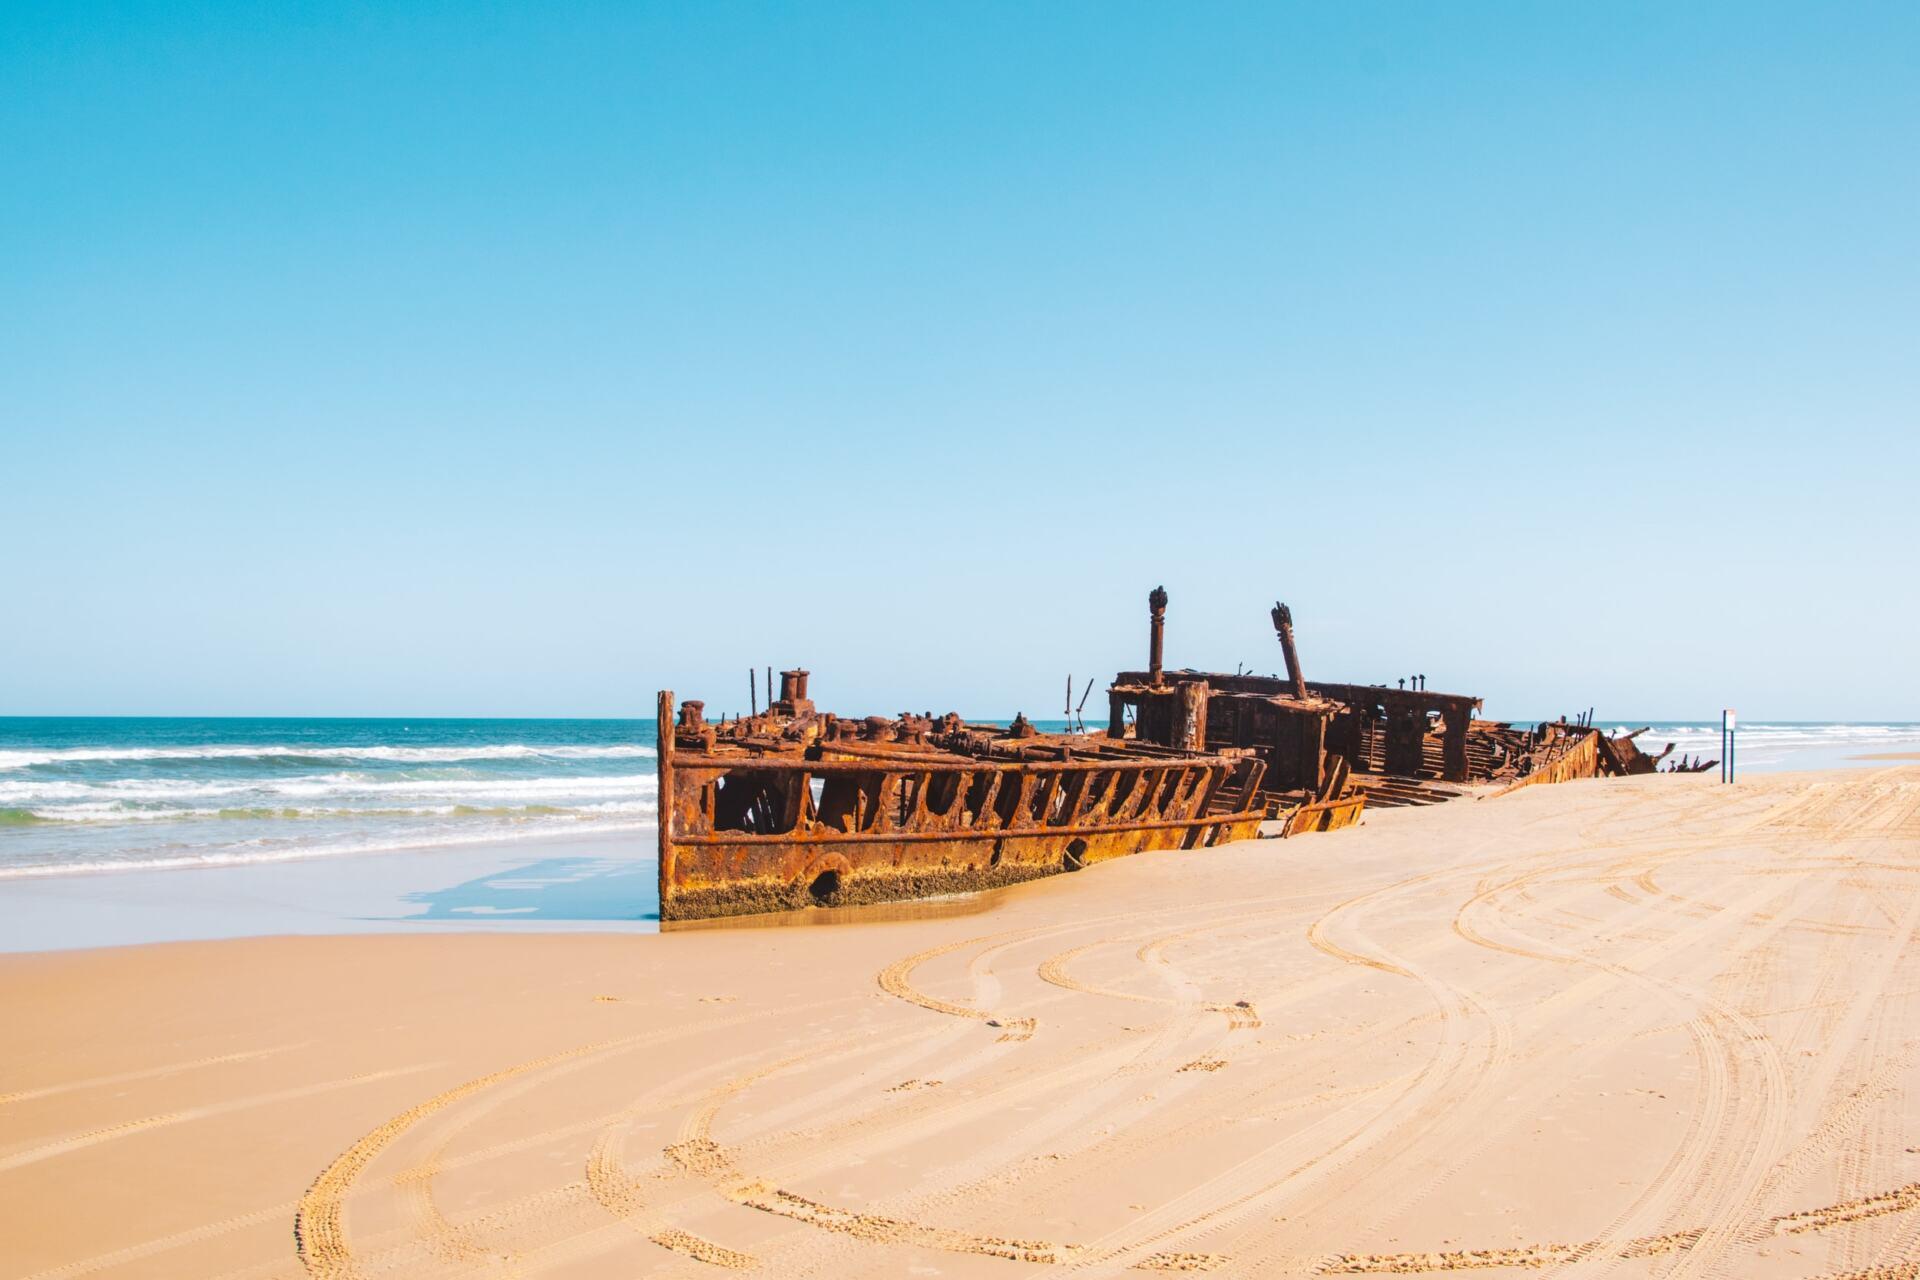 mehano shipwreck